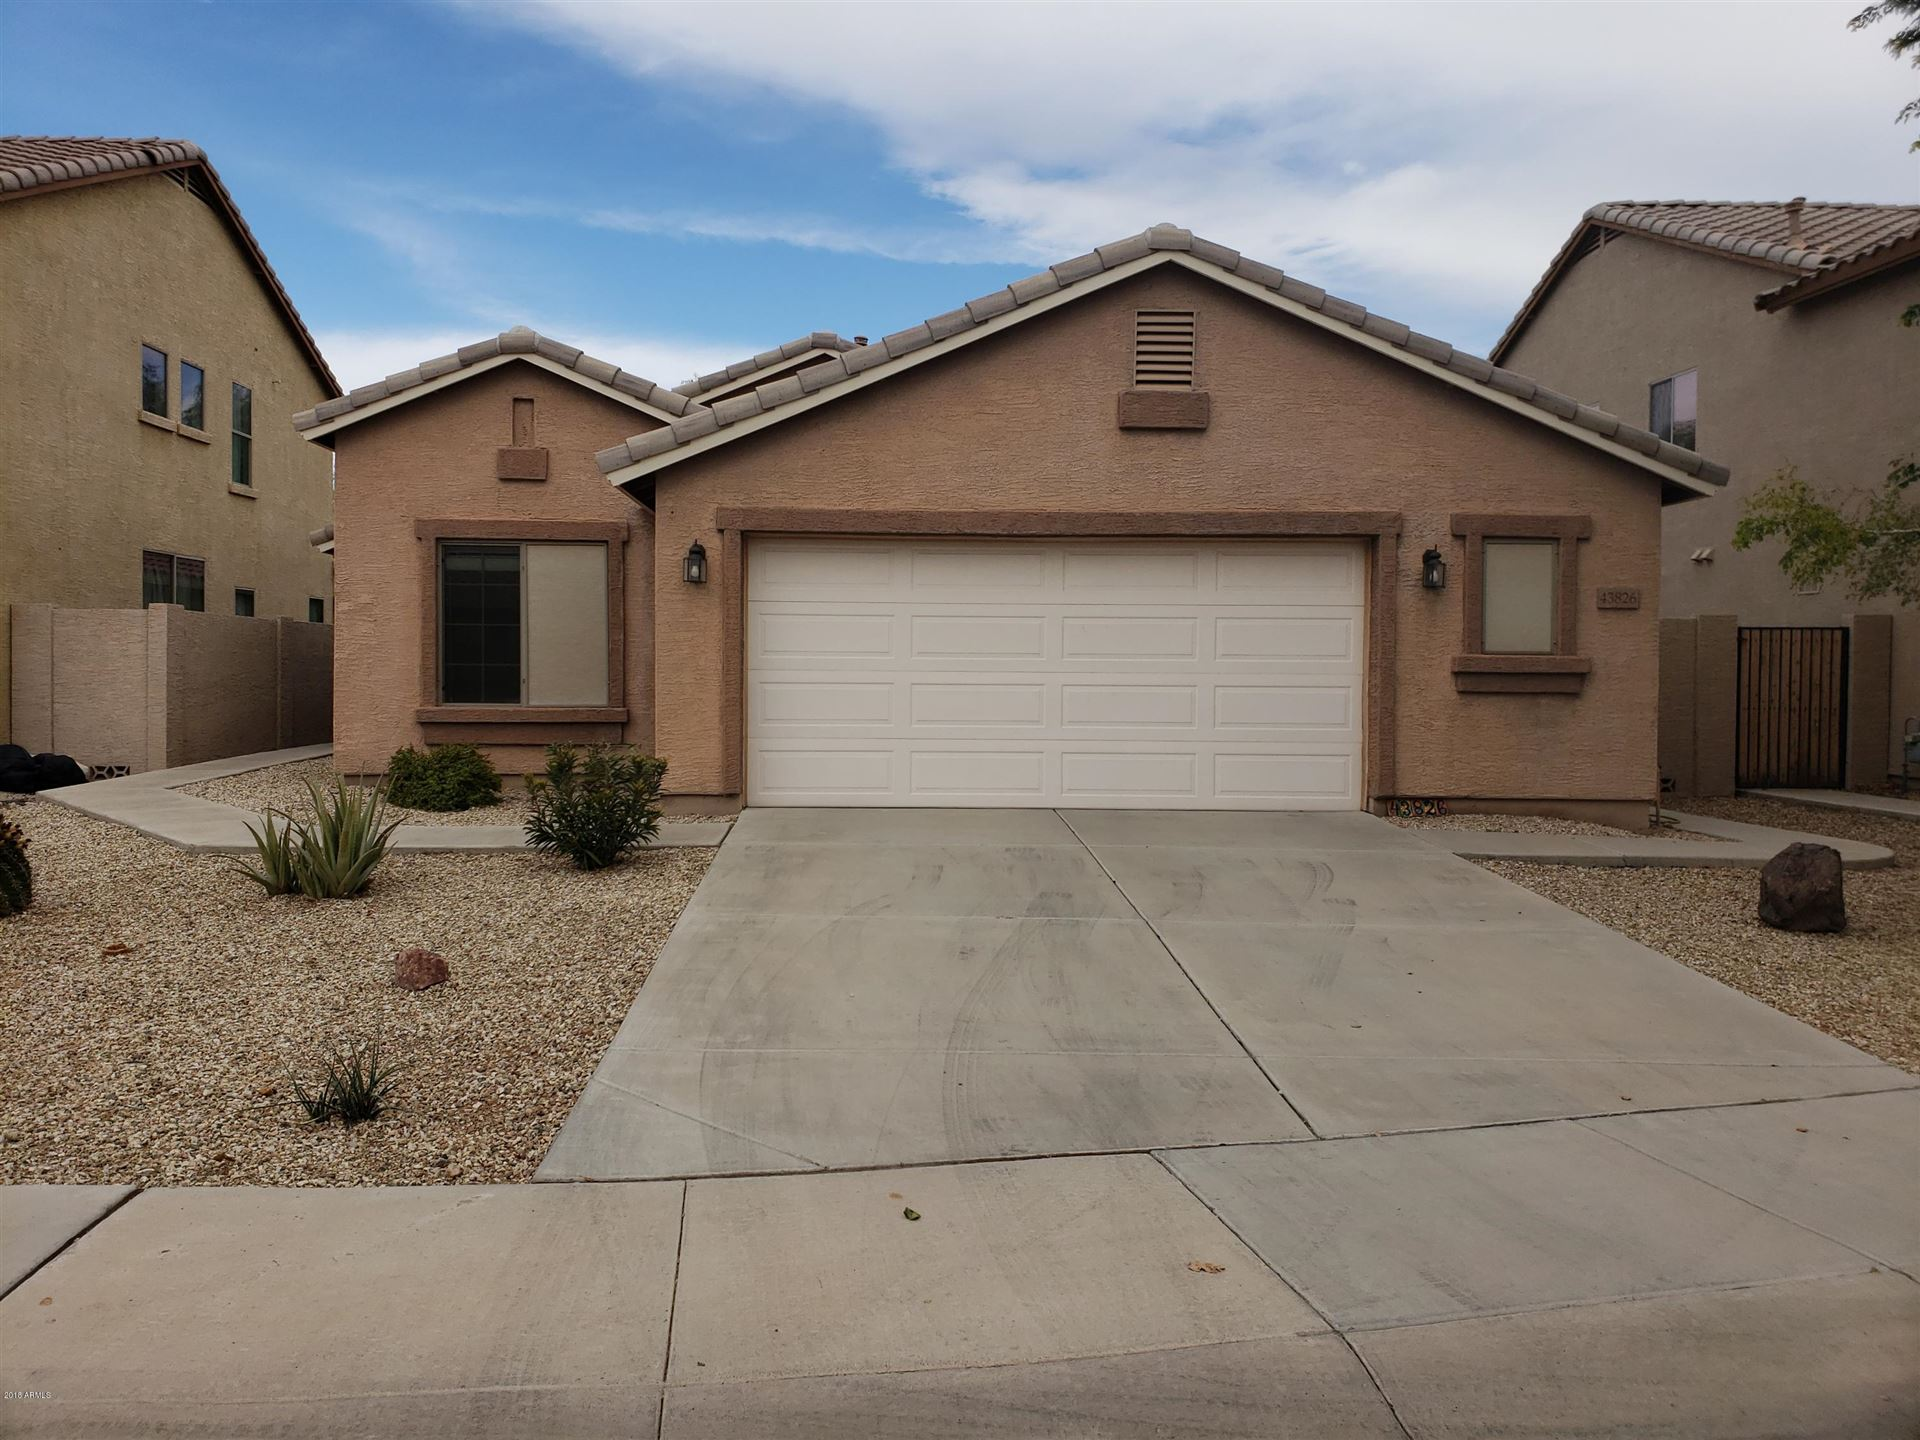 Photo for 43826 W LINDGREN Drive, Maricopa, AZ 85138 (MLS # 6176917)